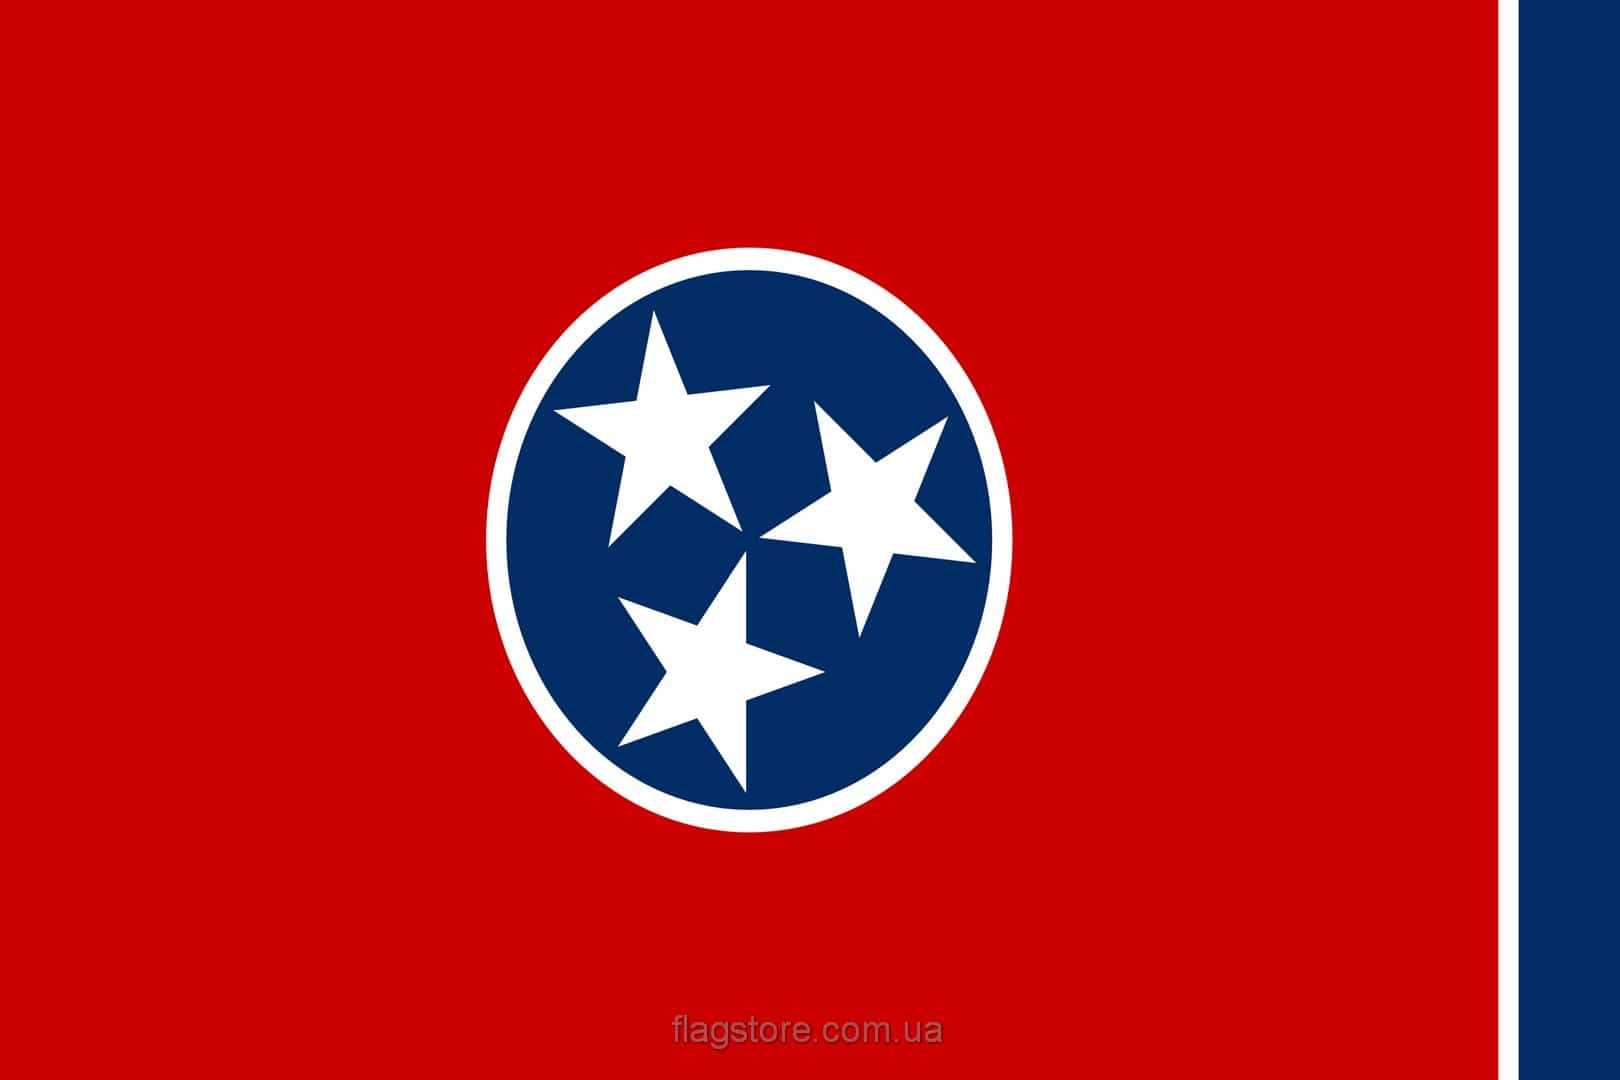 Купить флаг штата Теннесси